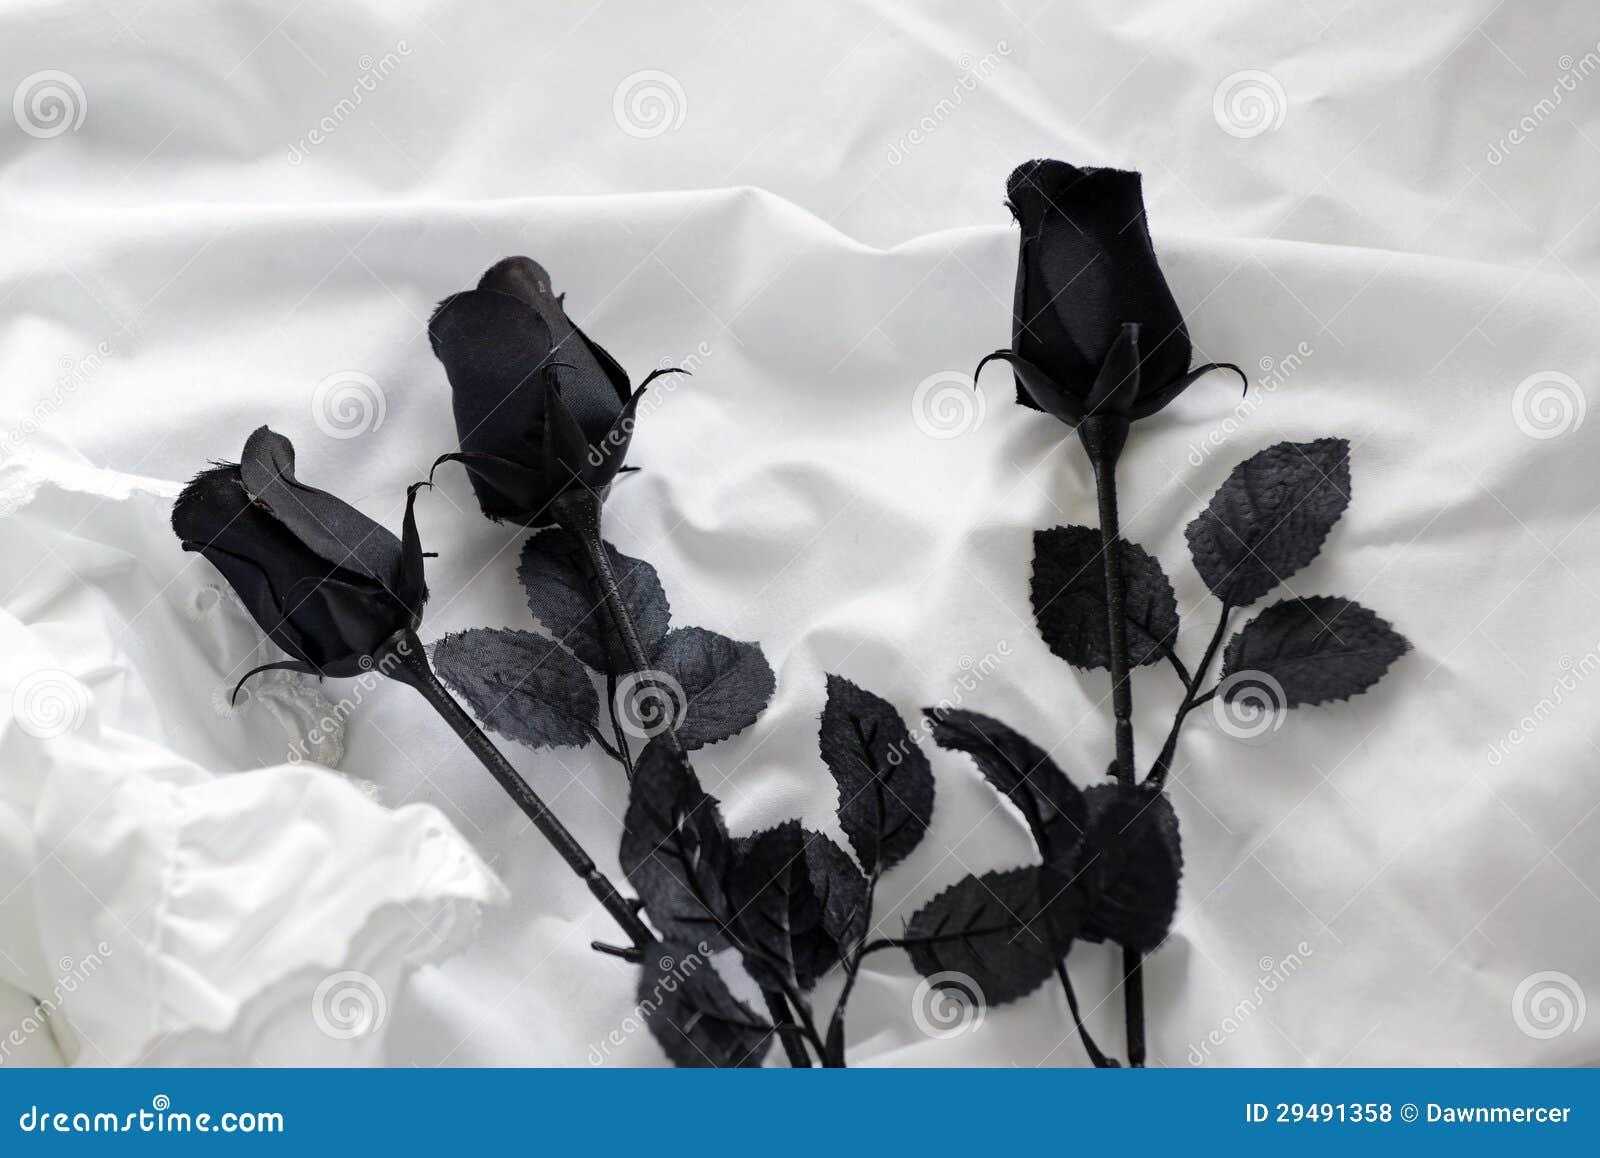 Bedroom Decor Black And White